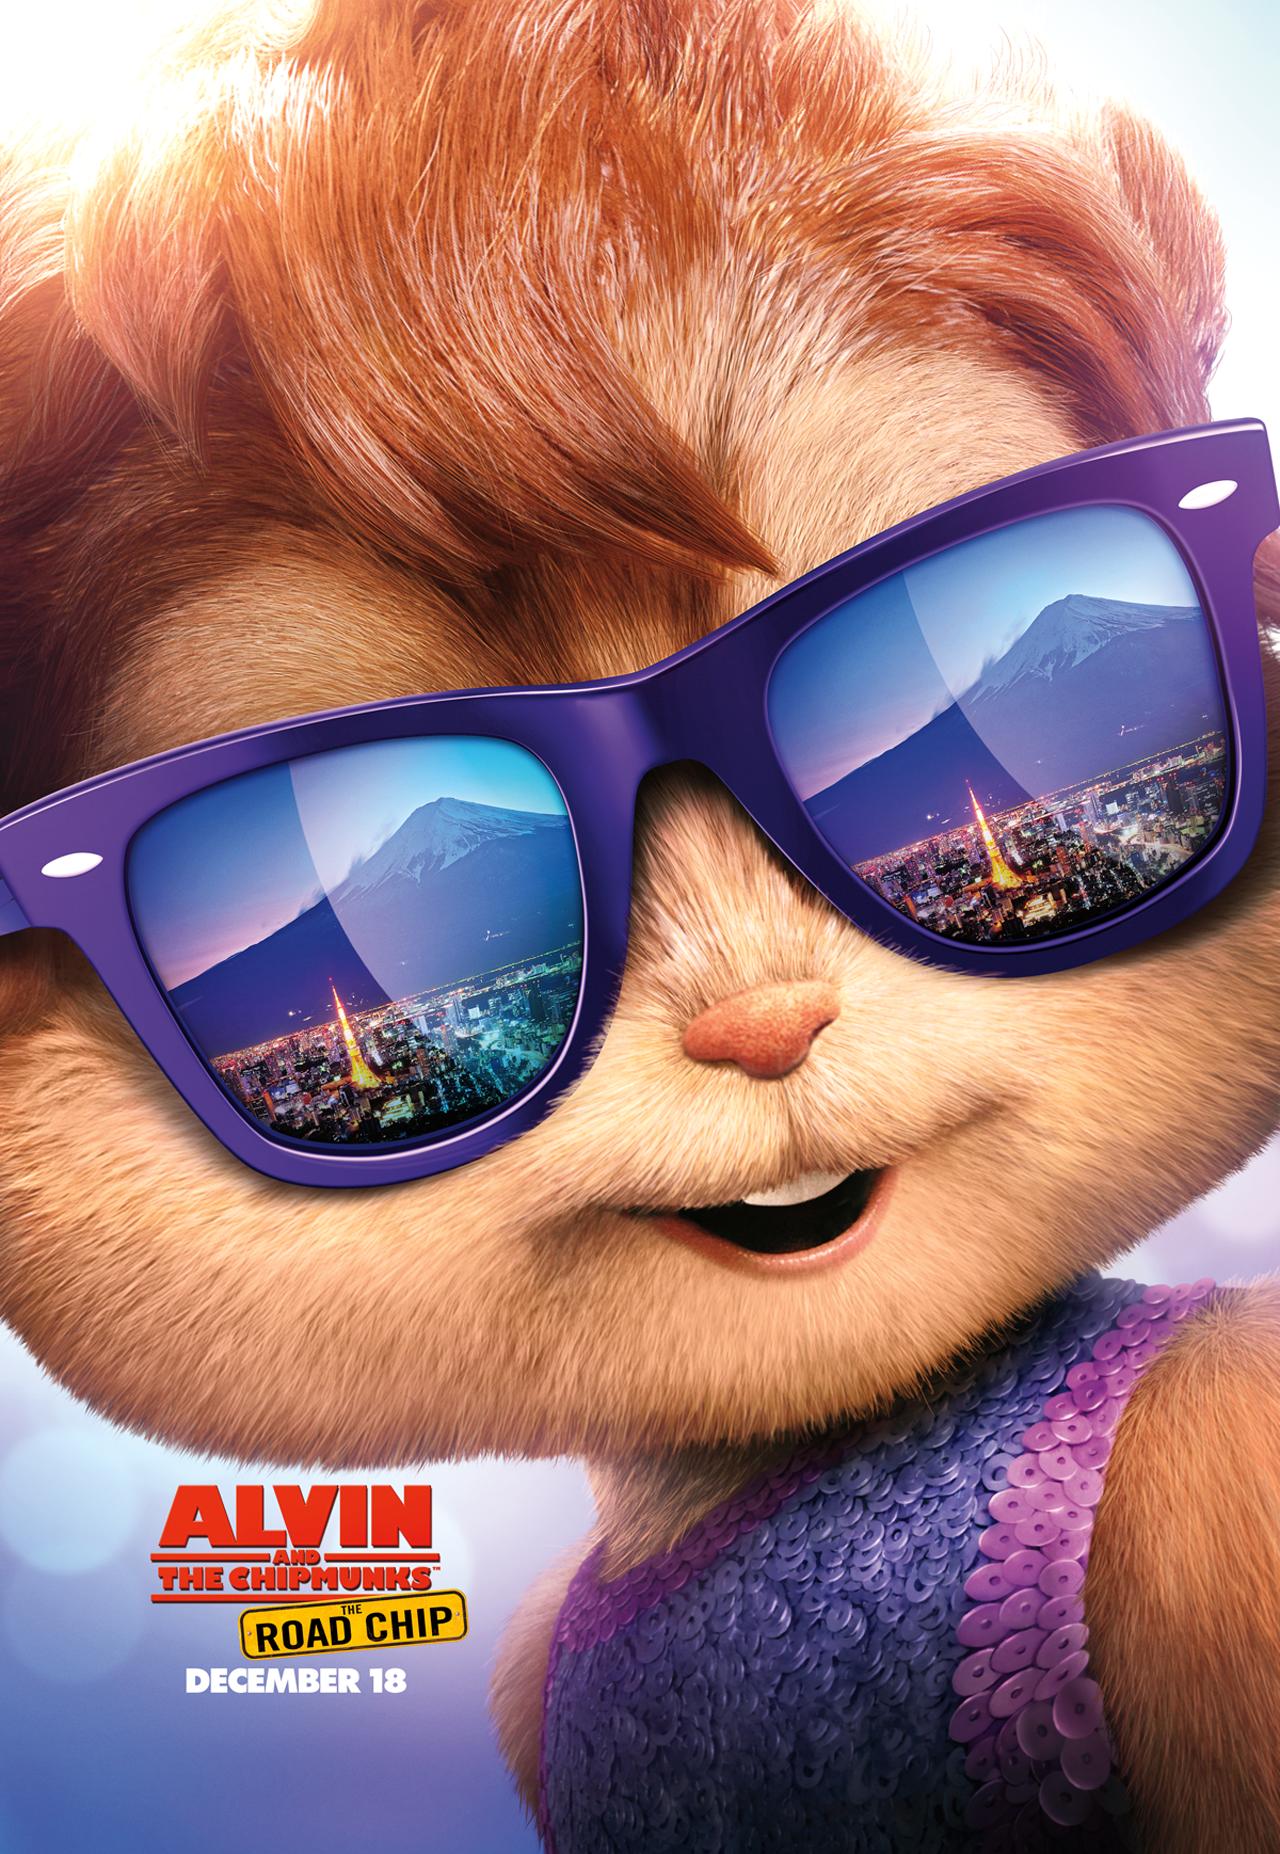 Alvin And The Chipmunks The Road Chip Comingsoon Net Ardillas Carteles De Cine Fondos De Comic